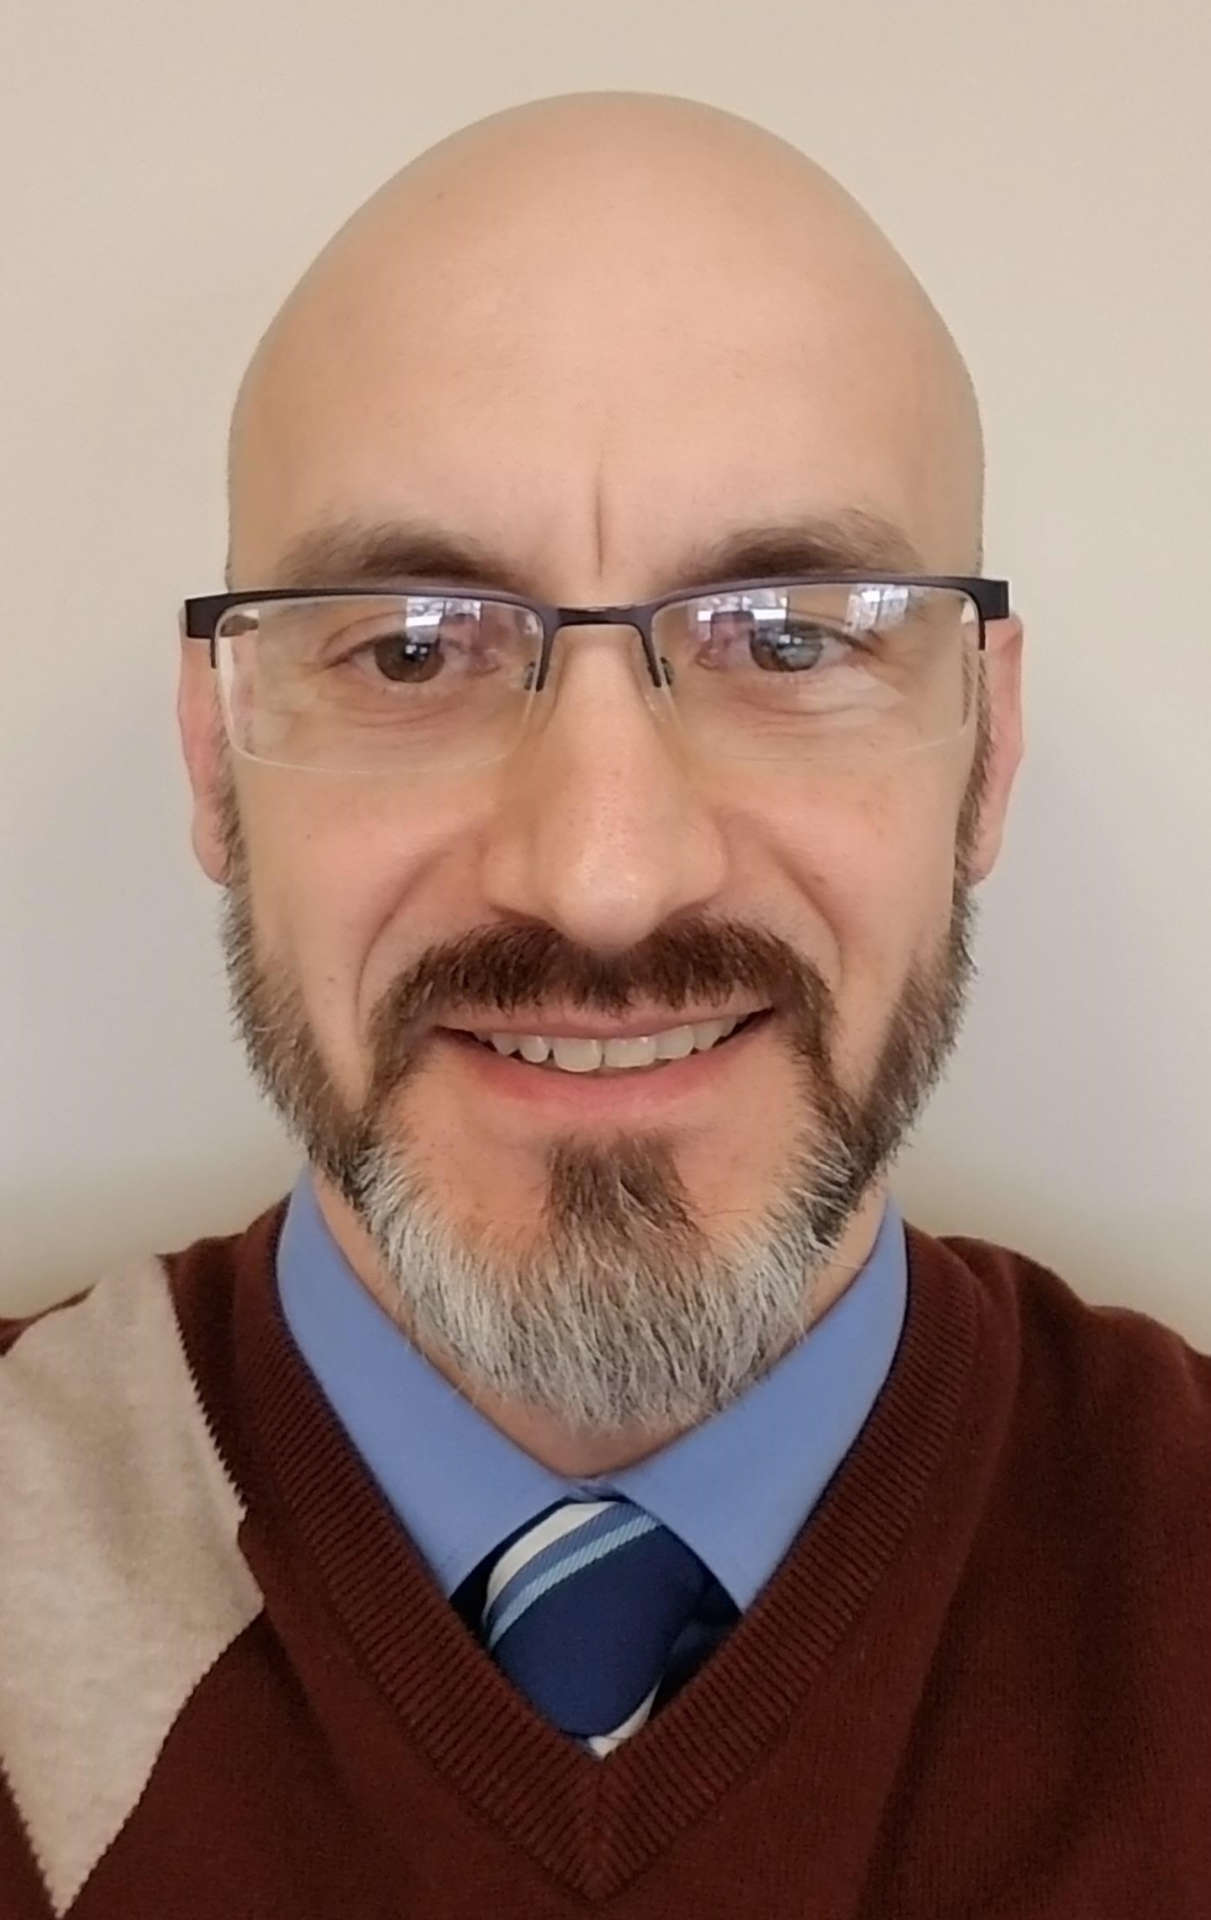 Sean Bryner, State of West Virginia Chief Probation Officer